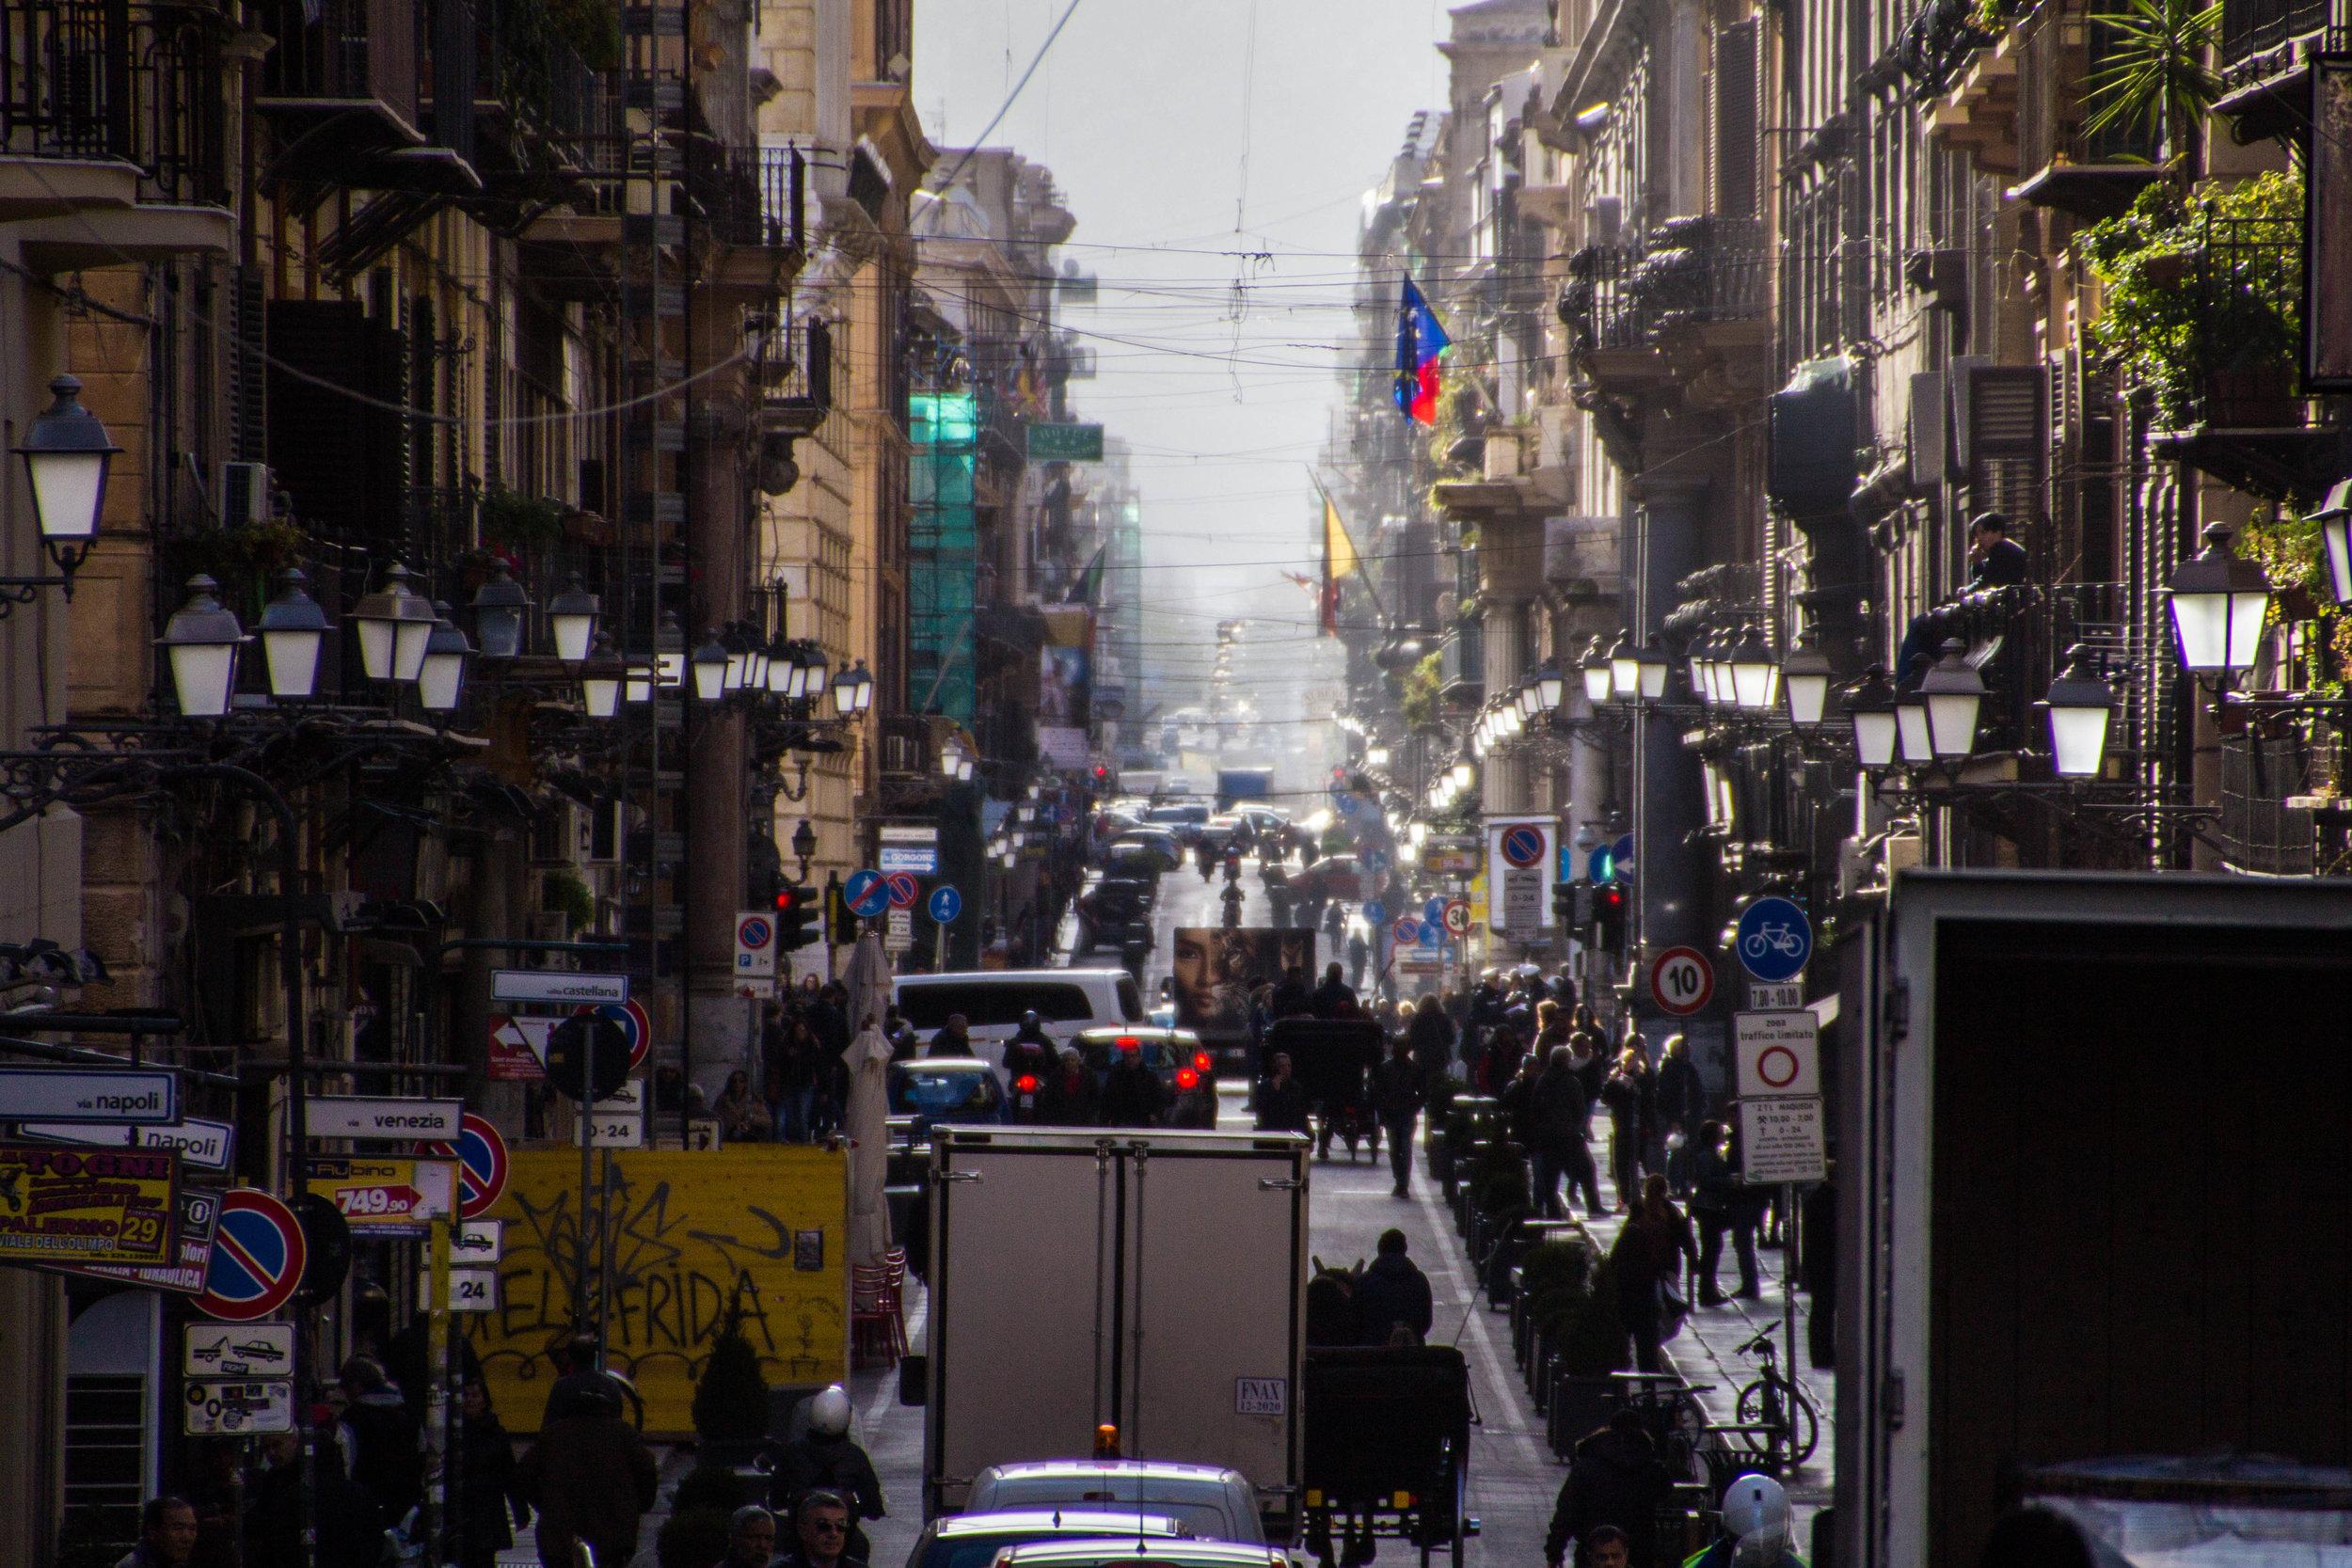 street-photography-palermo-sicily-54.jpg